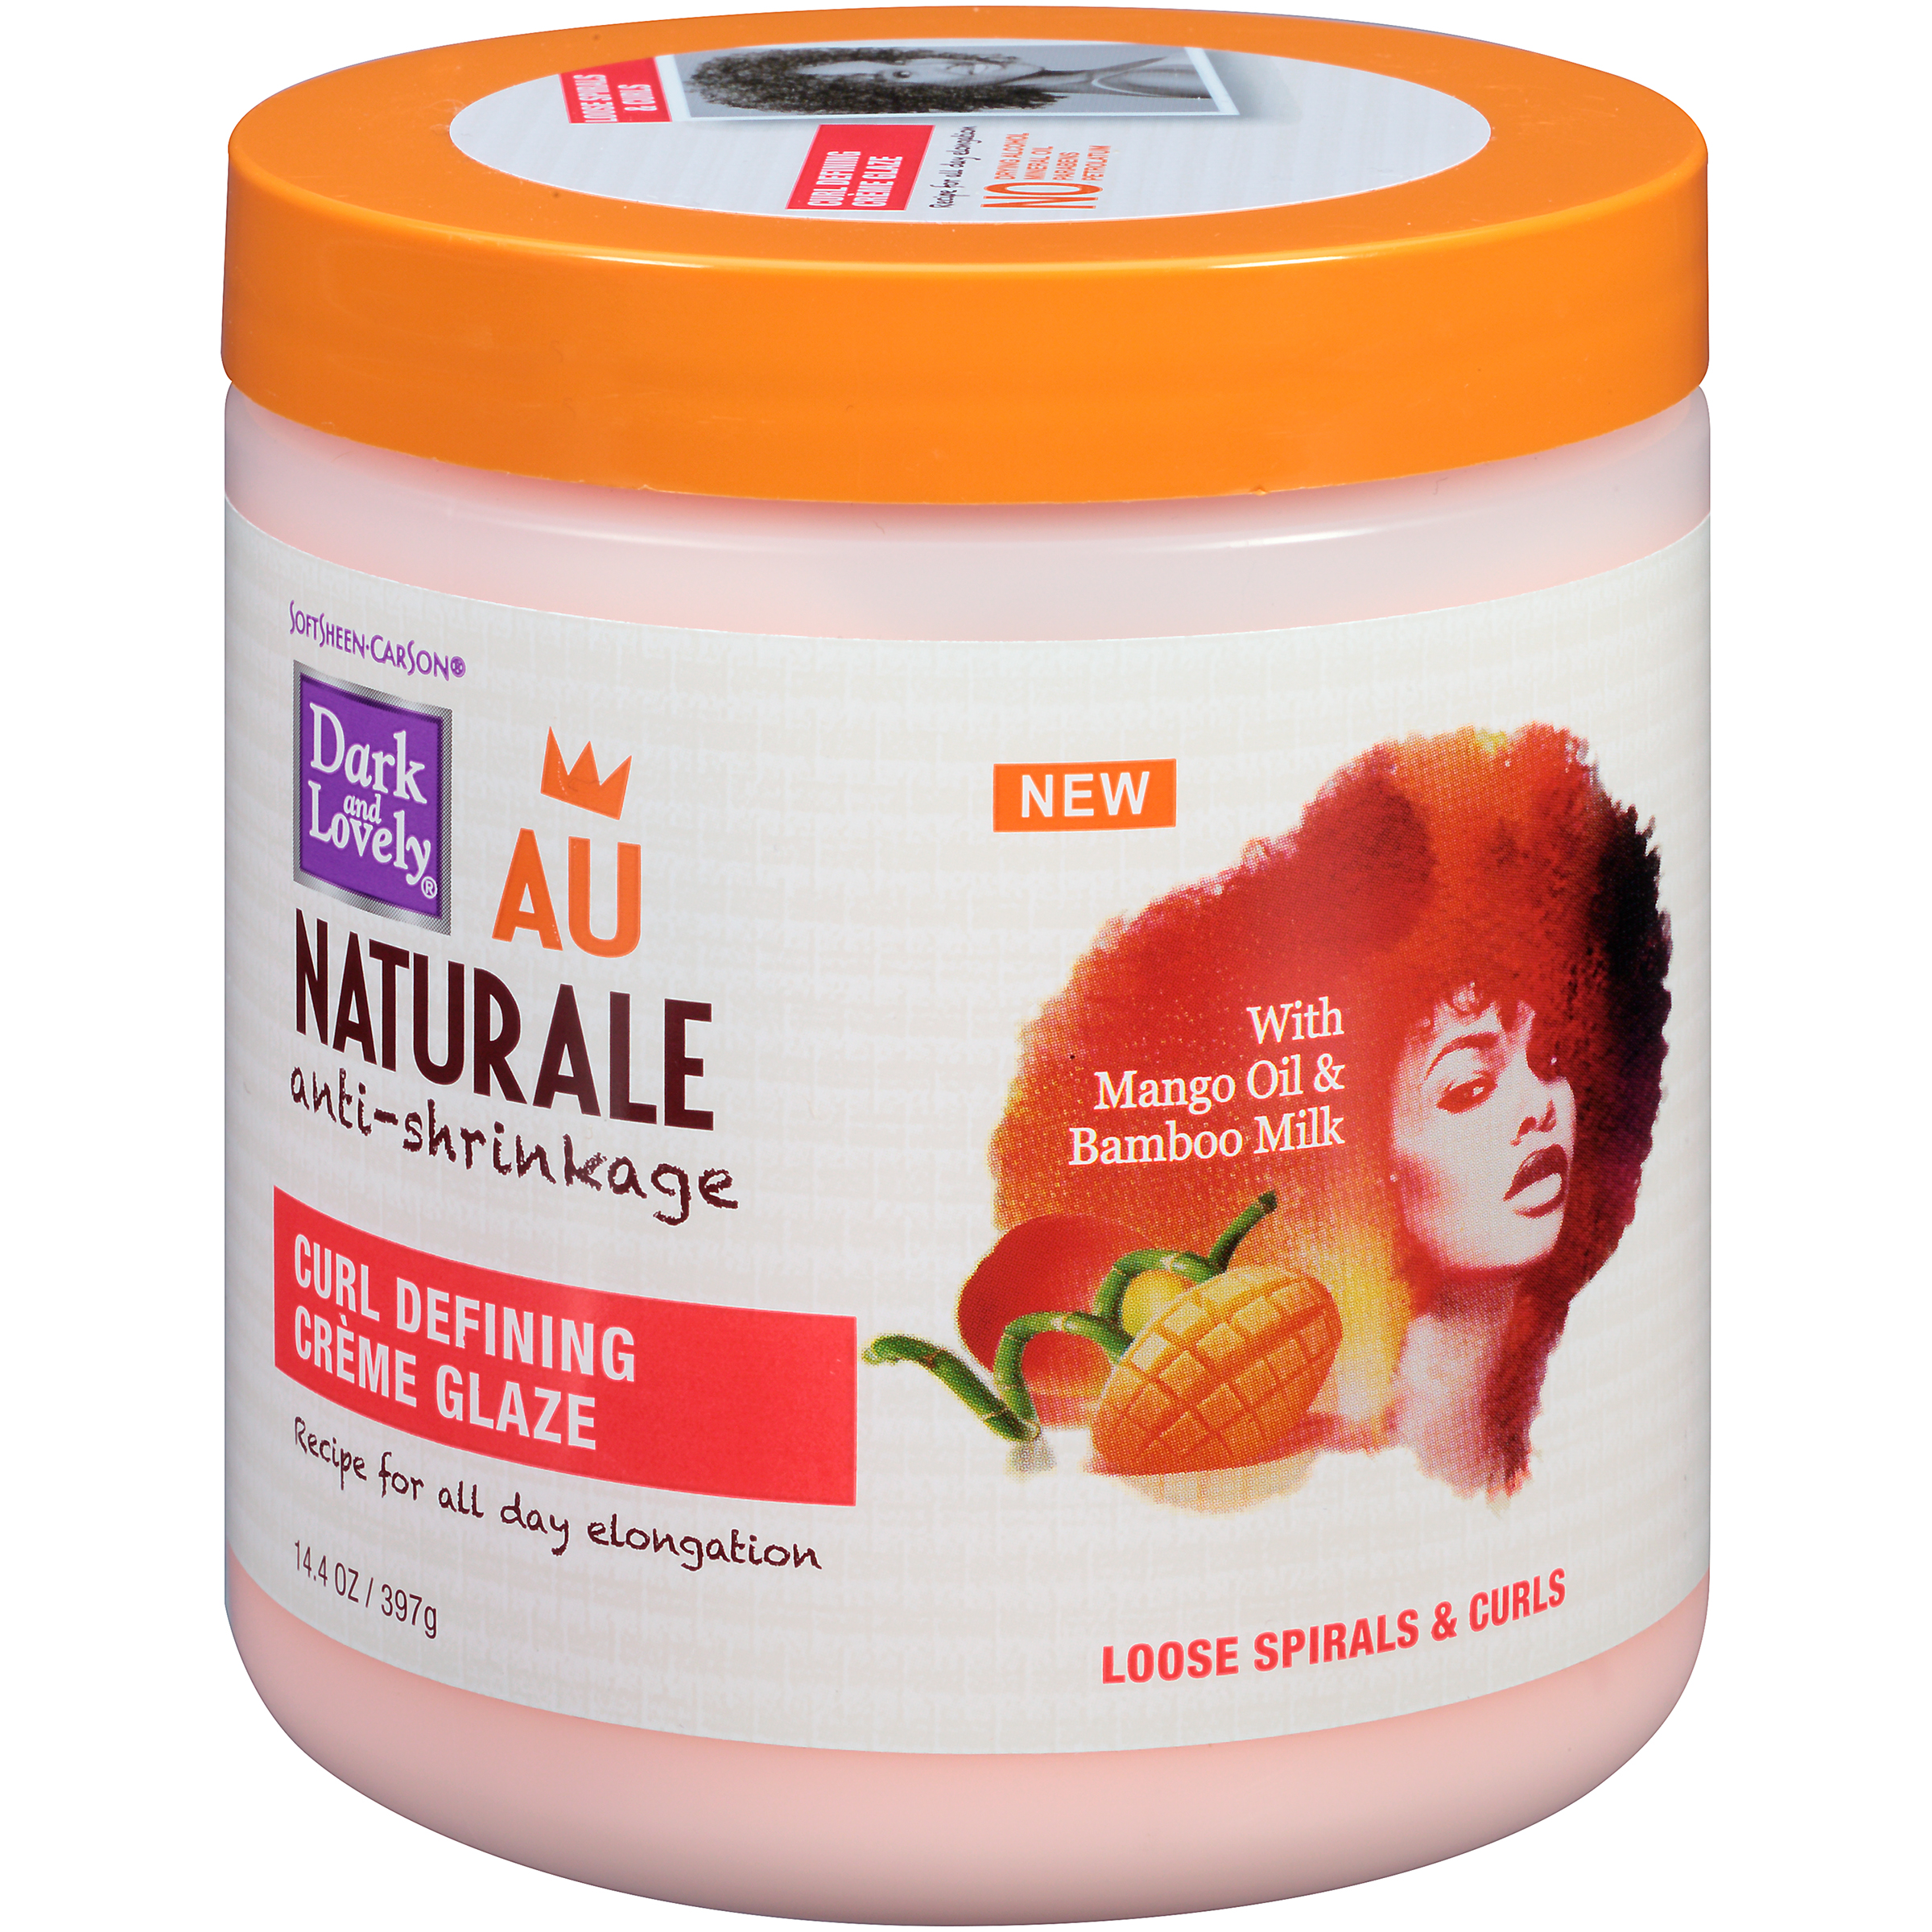 SoftSheen-Carson Dark and Lovely Au Naturale Anti-Shrinkage Curl Defining Creme Glaze, 14.4 oz